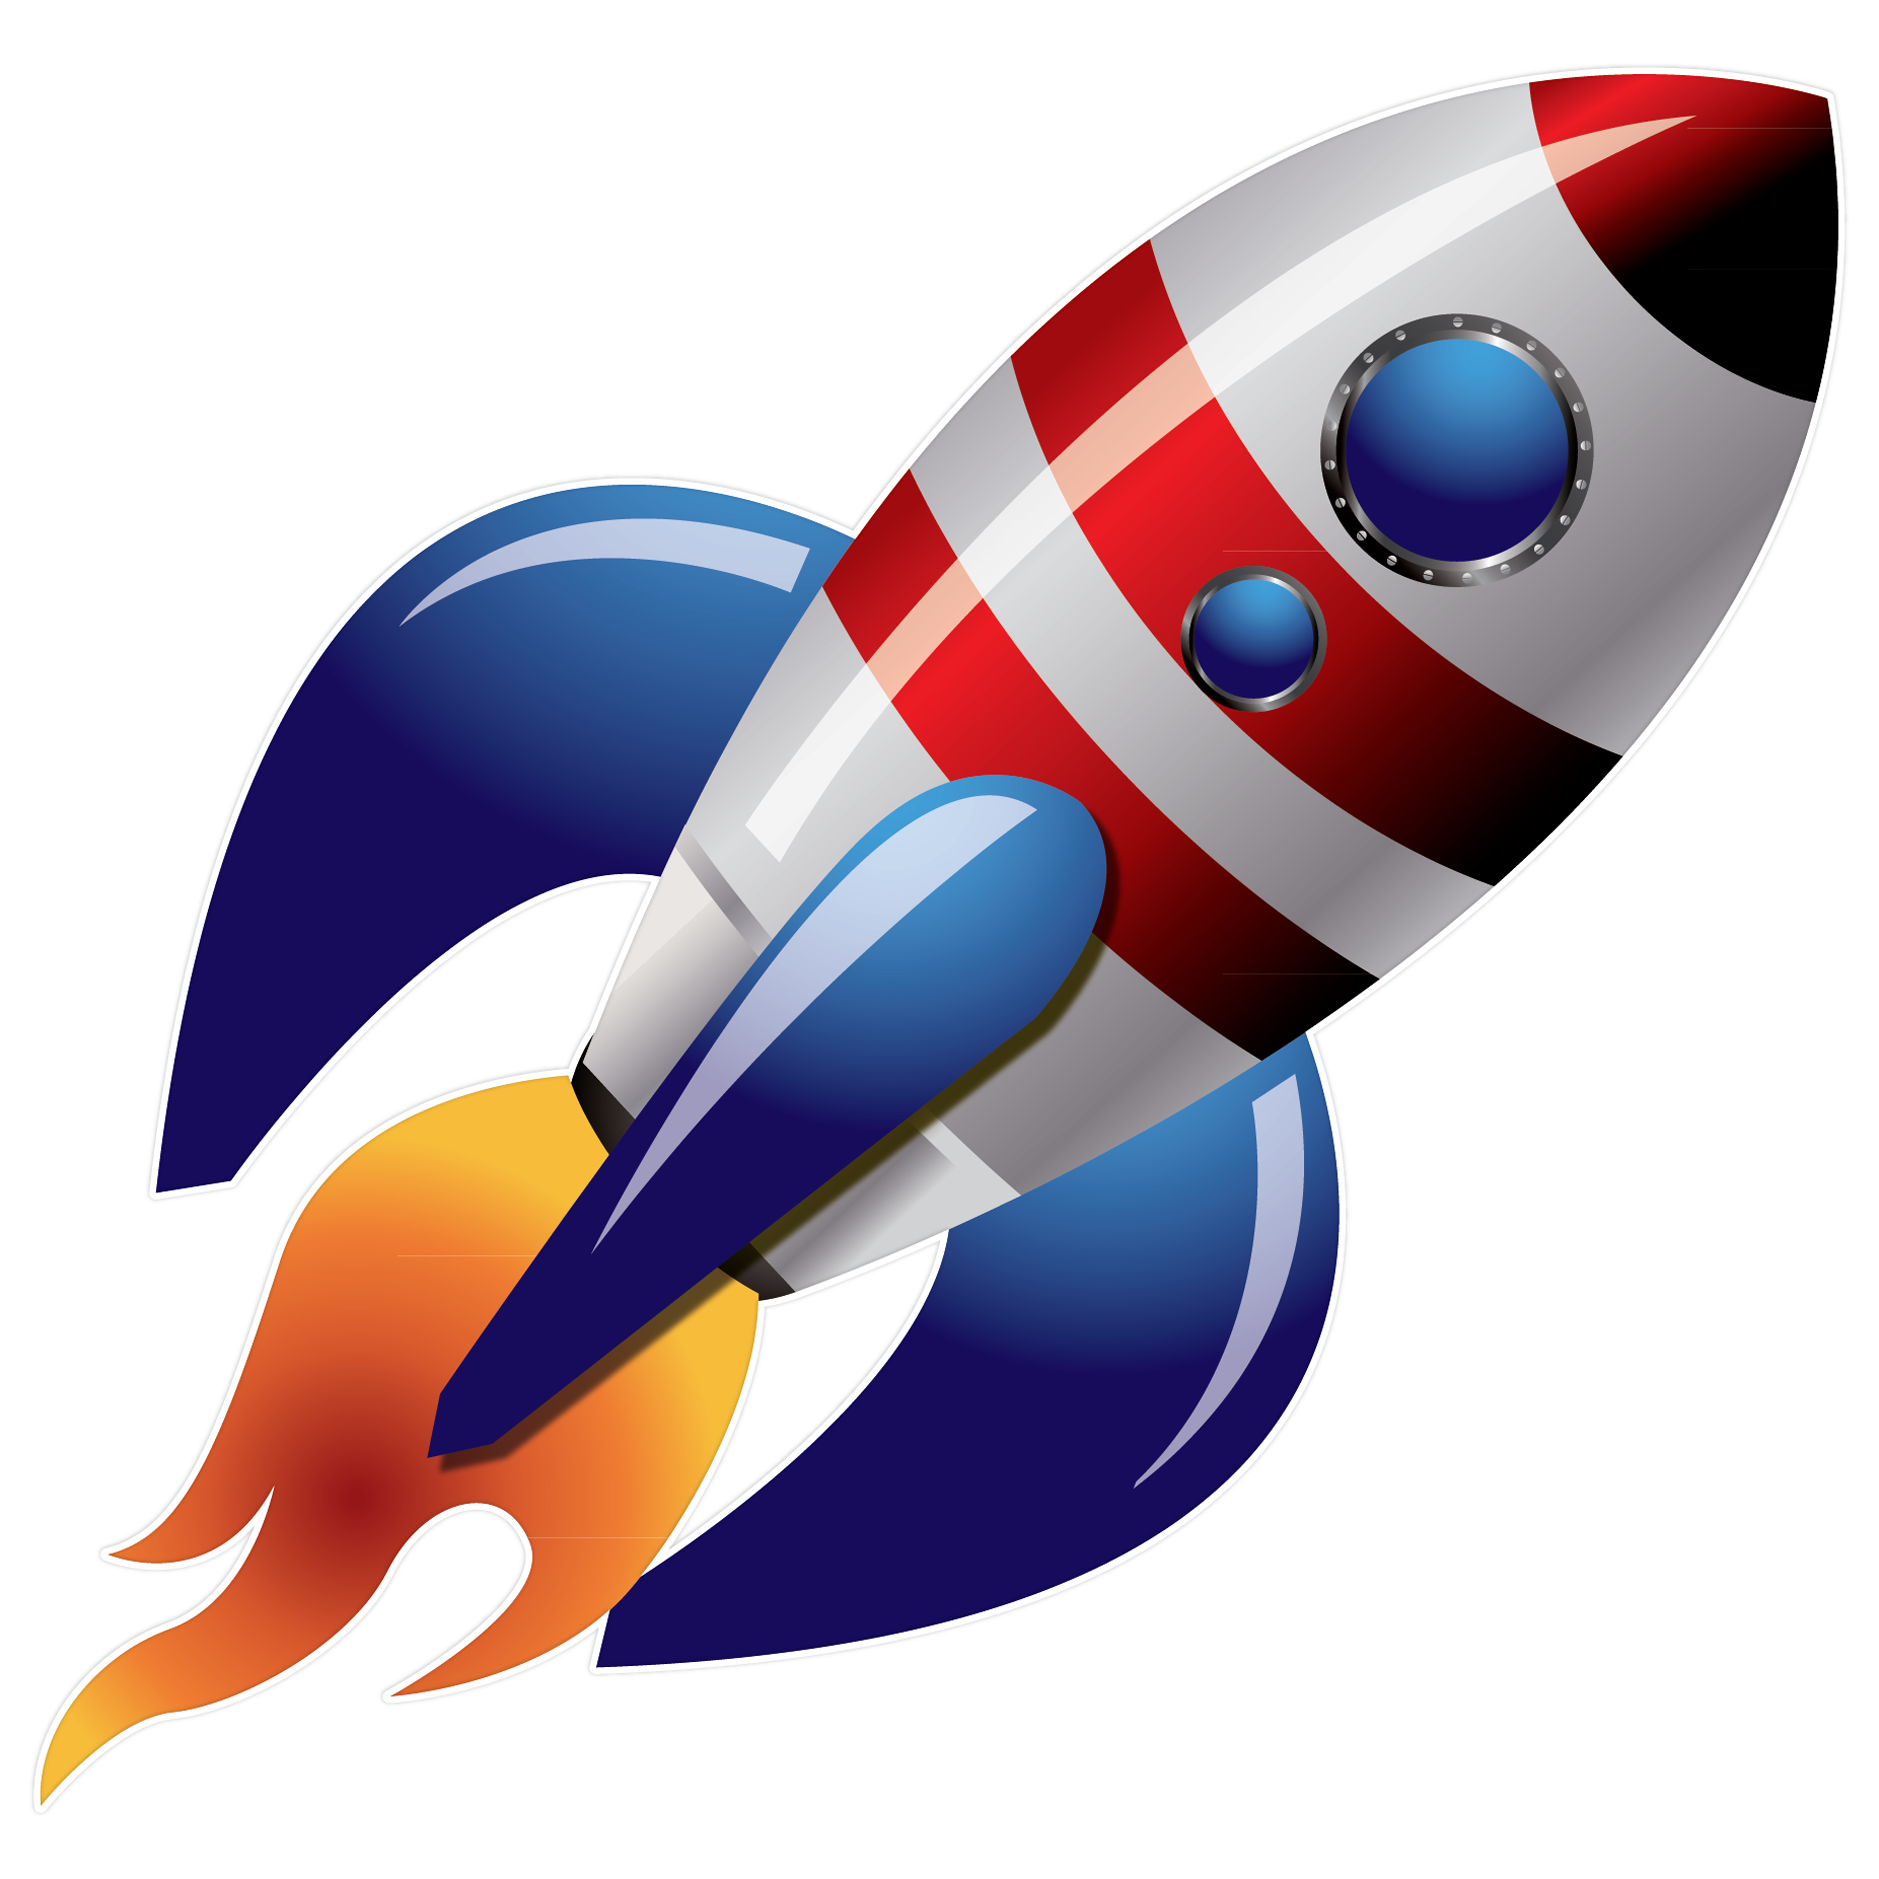 Rocket HD wallpapers #5 - PNG HD Of Rockets